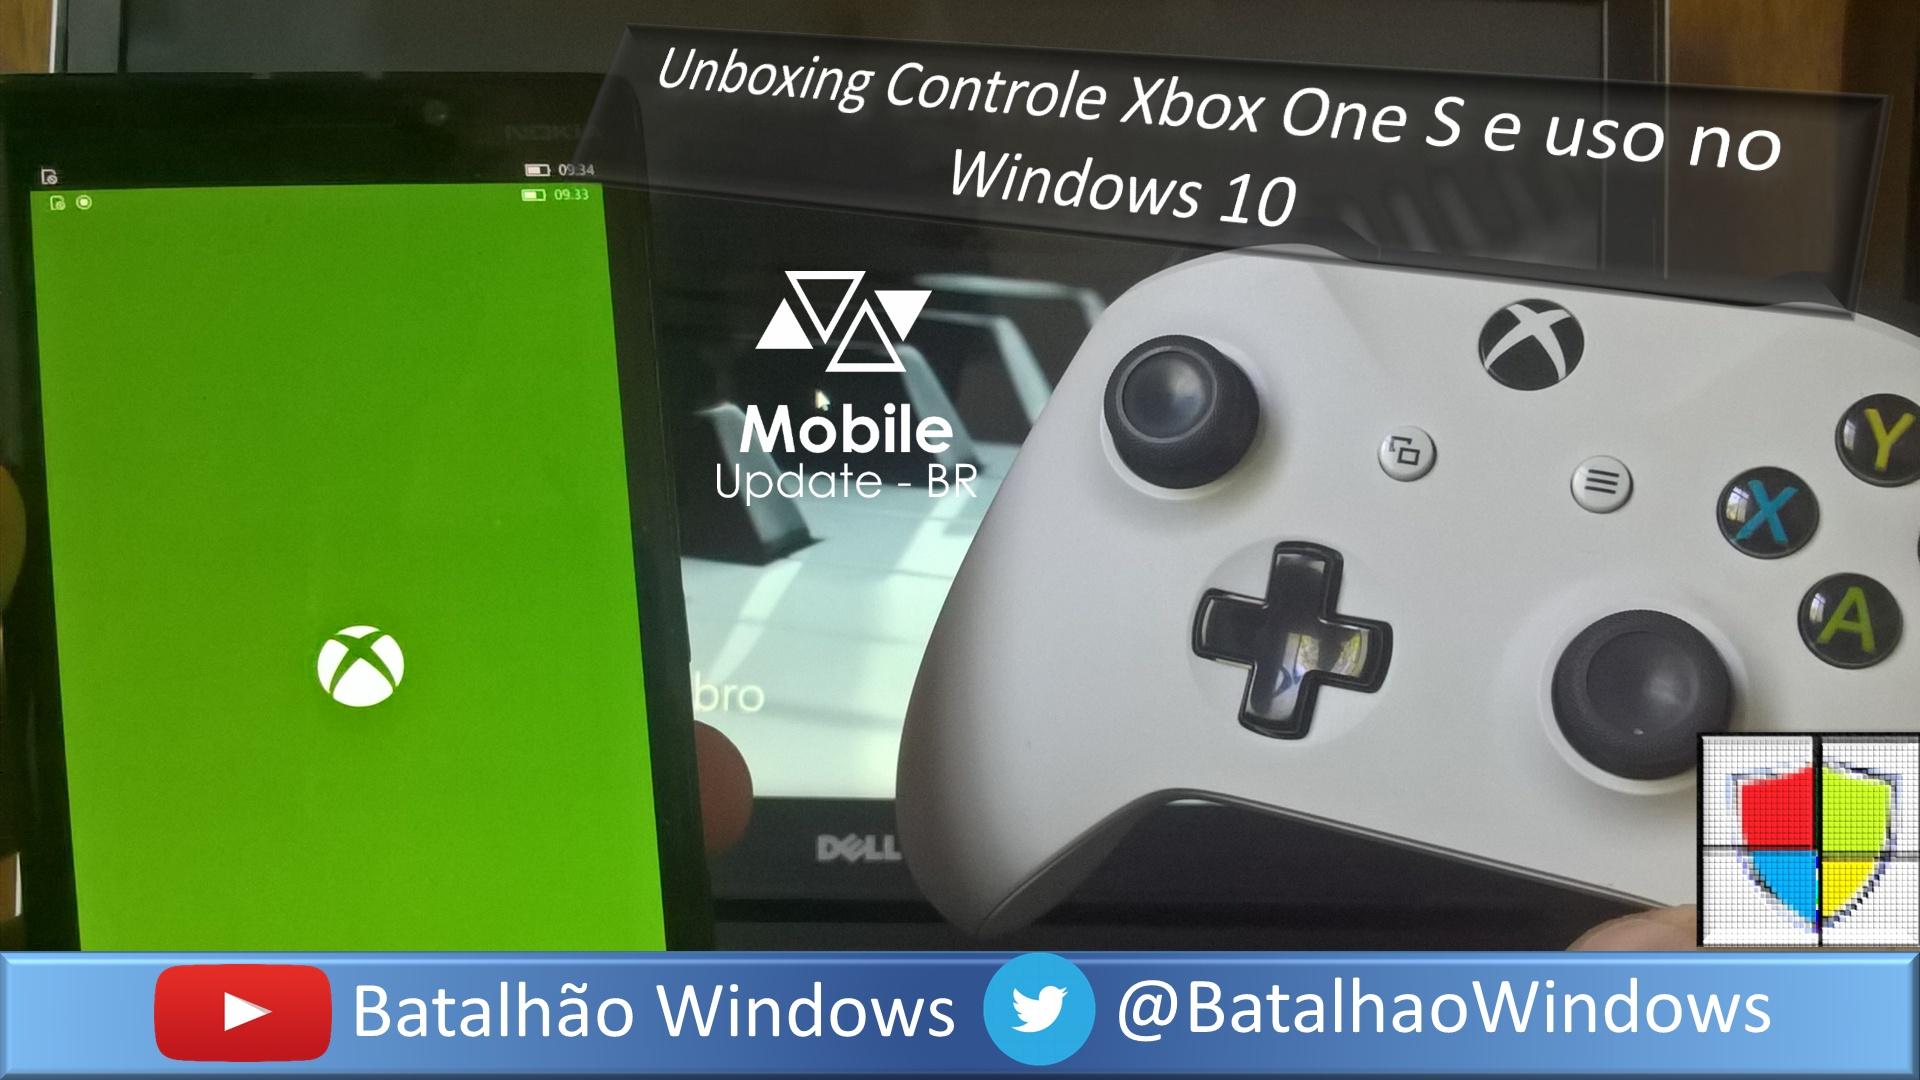 Xbox One S: Unboxing Controle e uso no Windows 10